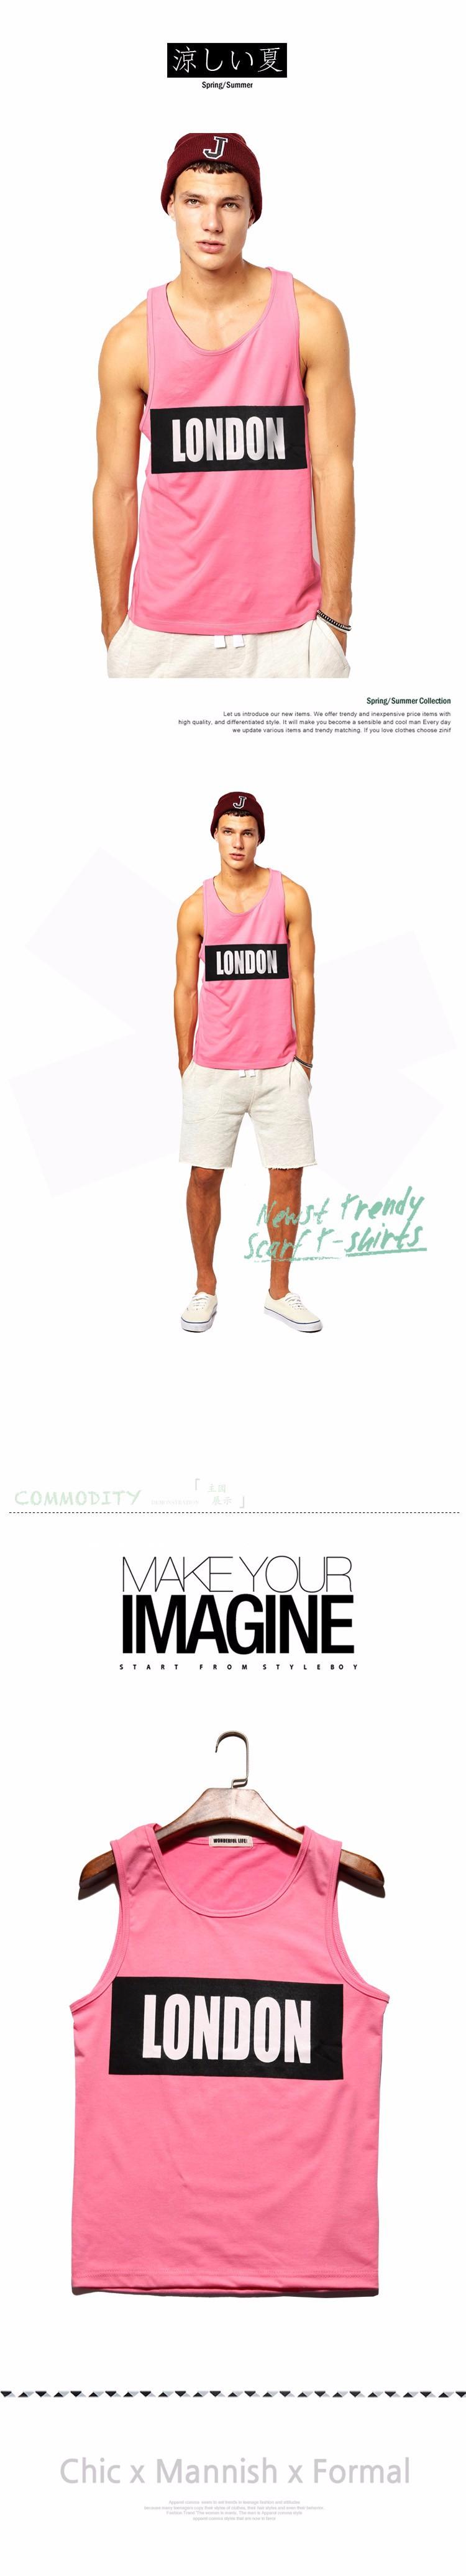 Tank Top men gymshark regata masculine Vest summer style gym shark Tshirt gasp Singlet bodybuilding Slim Gym Sport Sleeveless 49 (2)